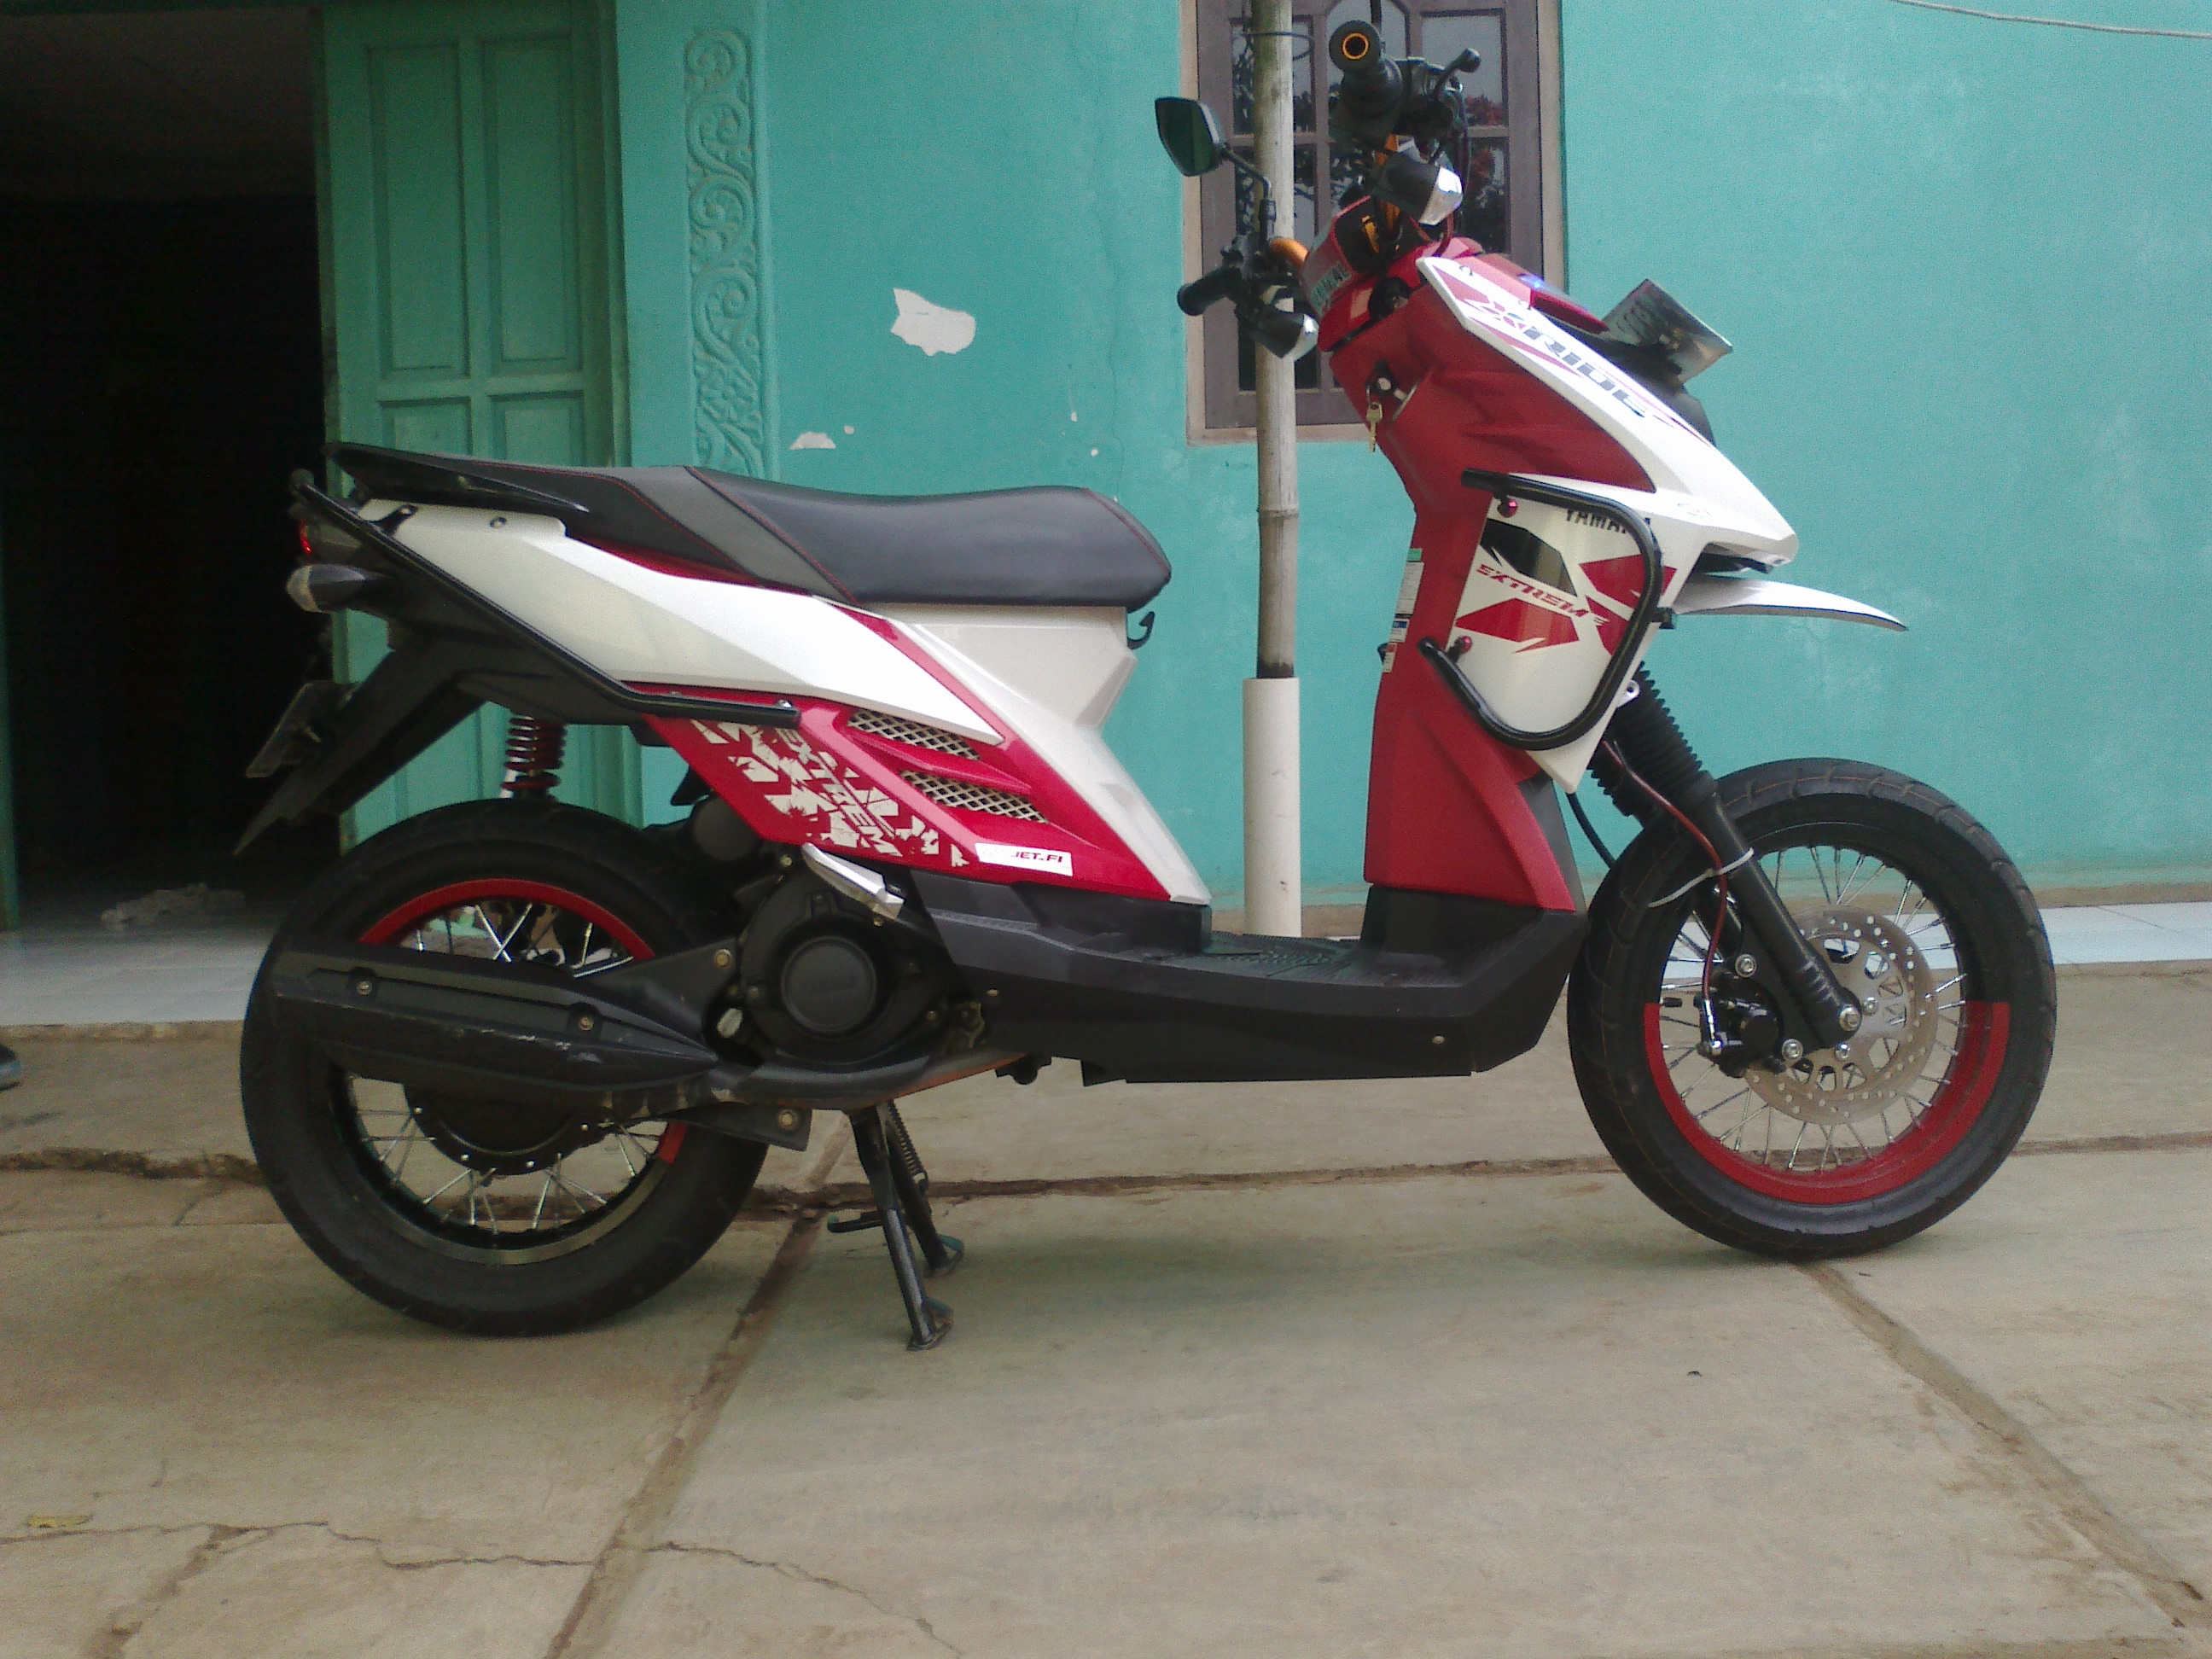 Modif X Ride Jadi Supermoto Viwimotocom